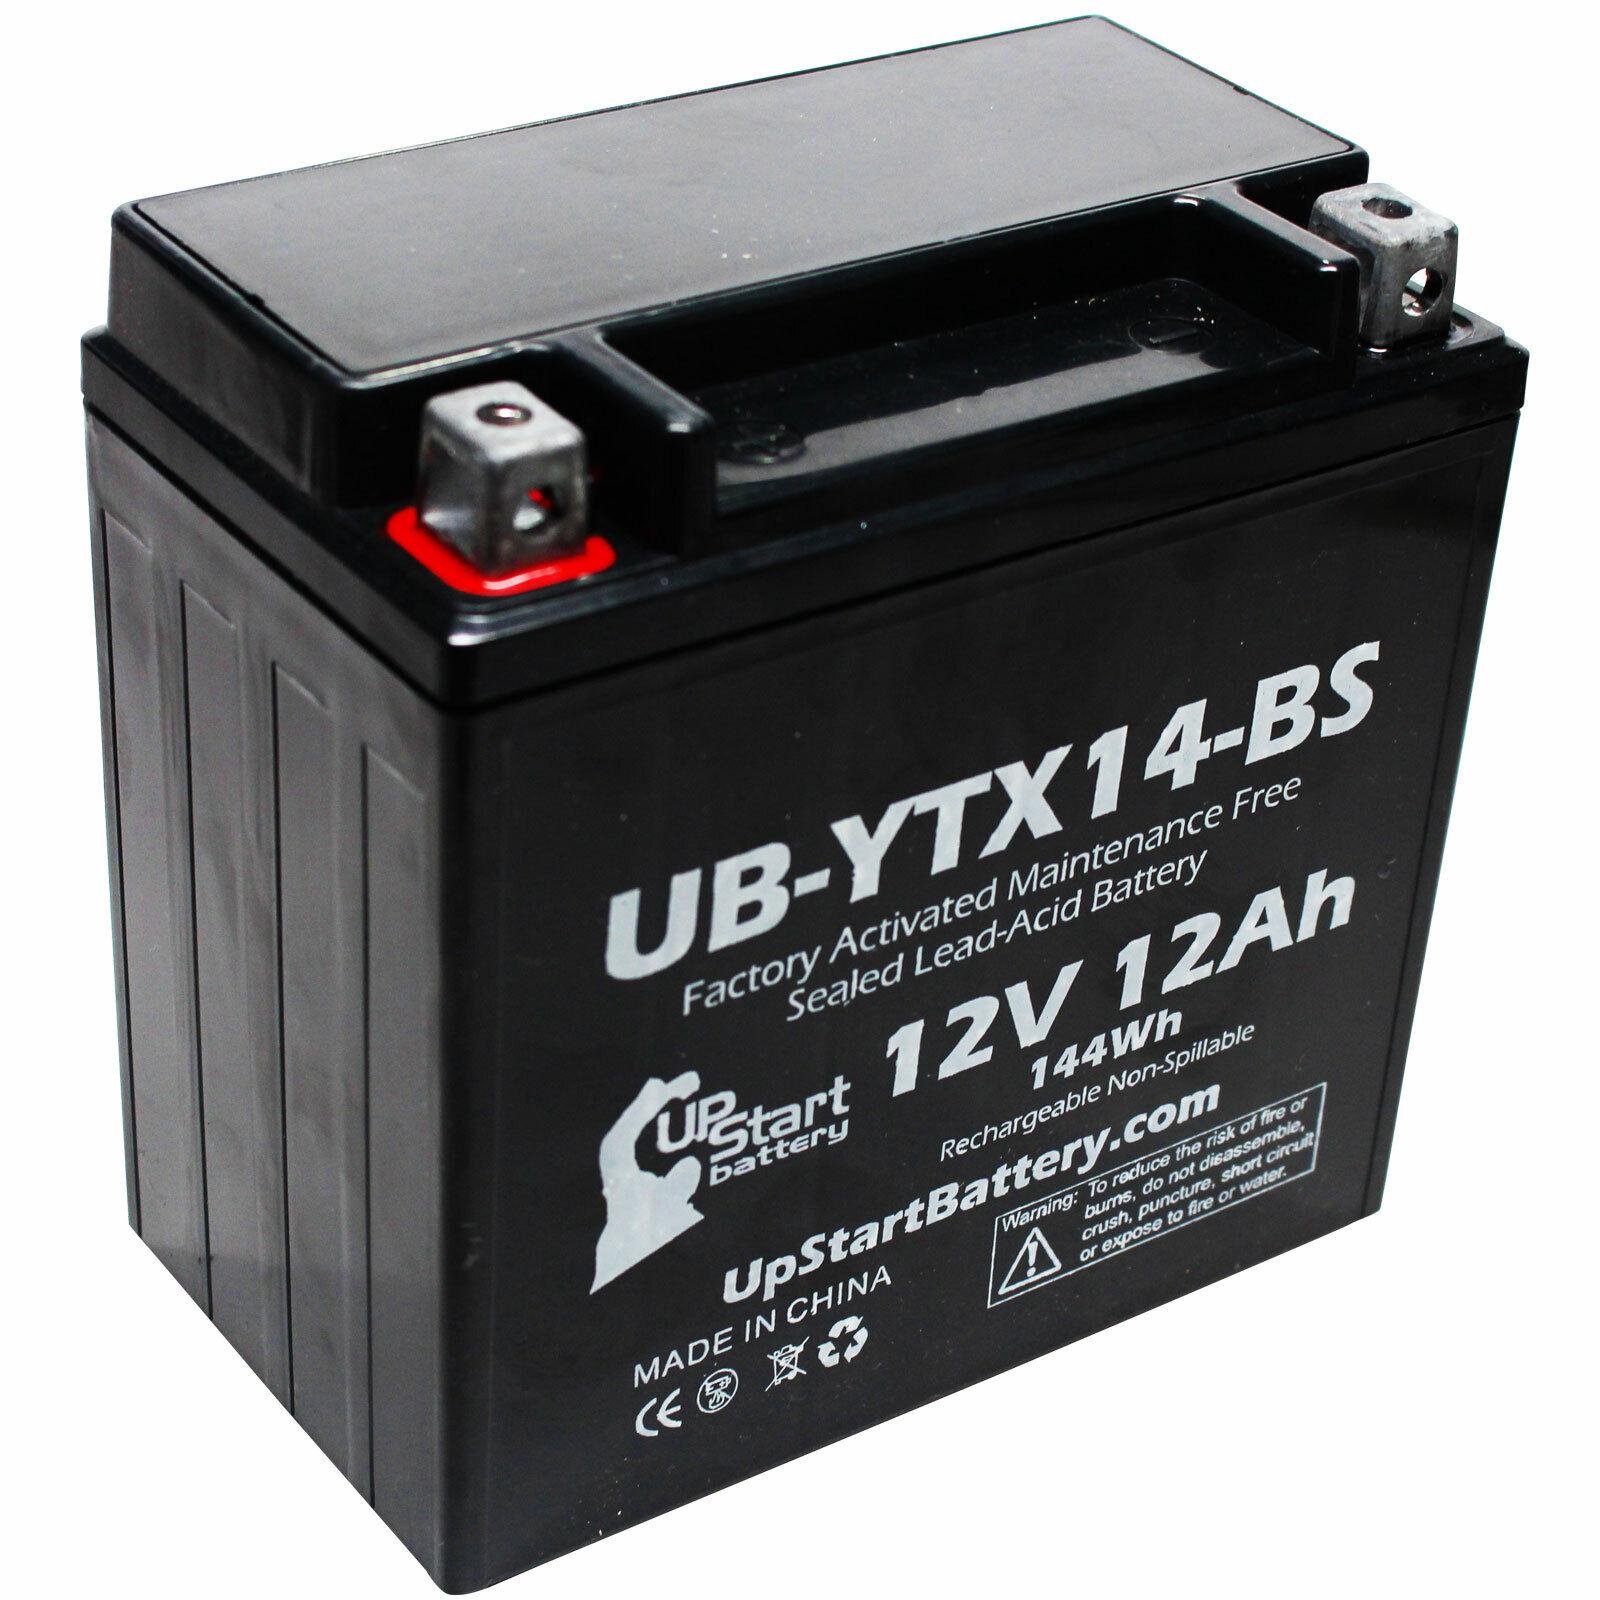 12V 12AH Battery for 1998 Honda TRX450 FourTrax Foreman S, ES 450 CC